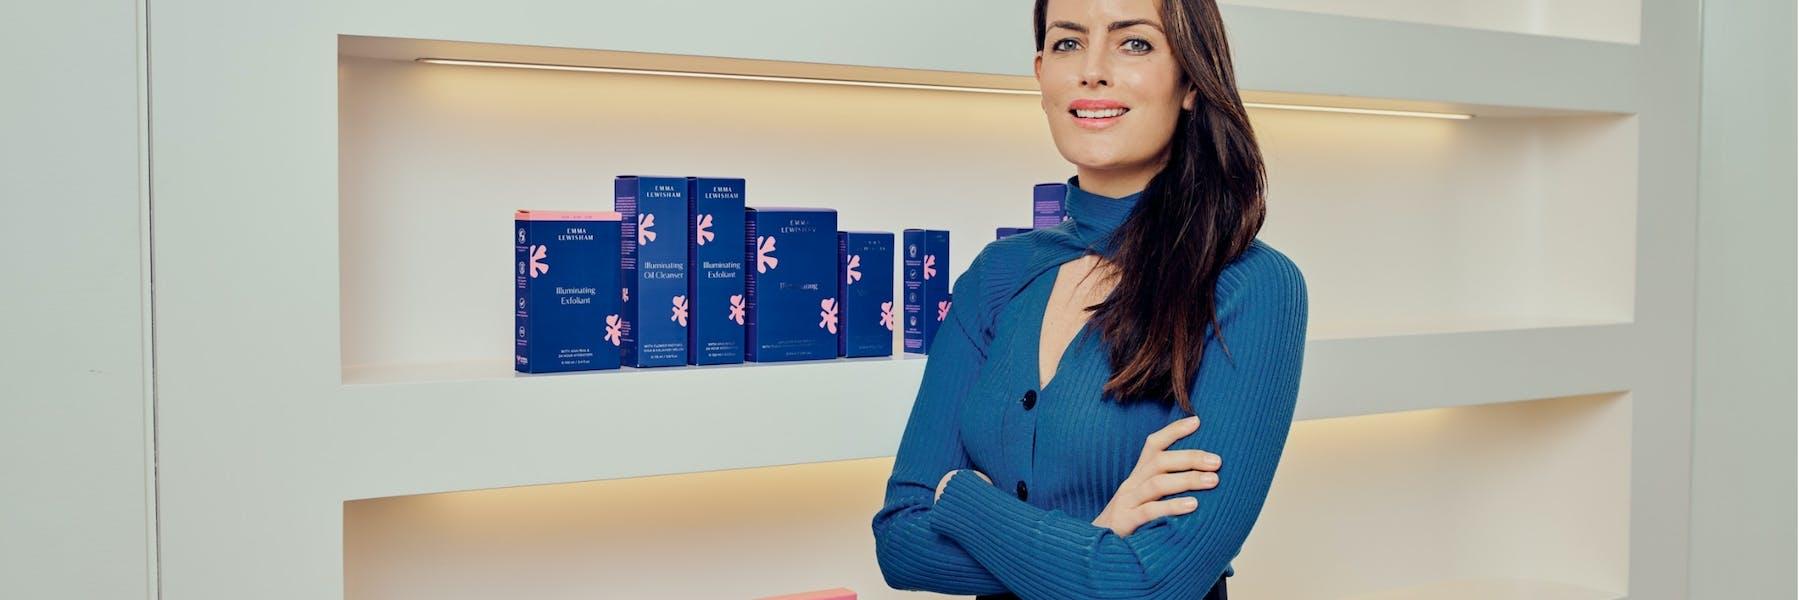 Emma Lewisham with her natural beauty products PHOTO: Mark Leedom